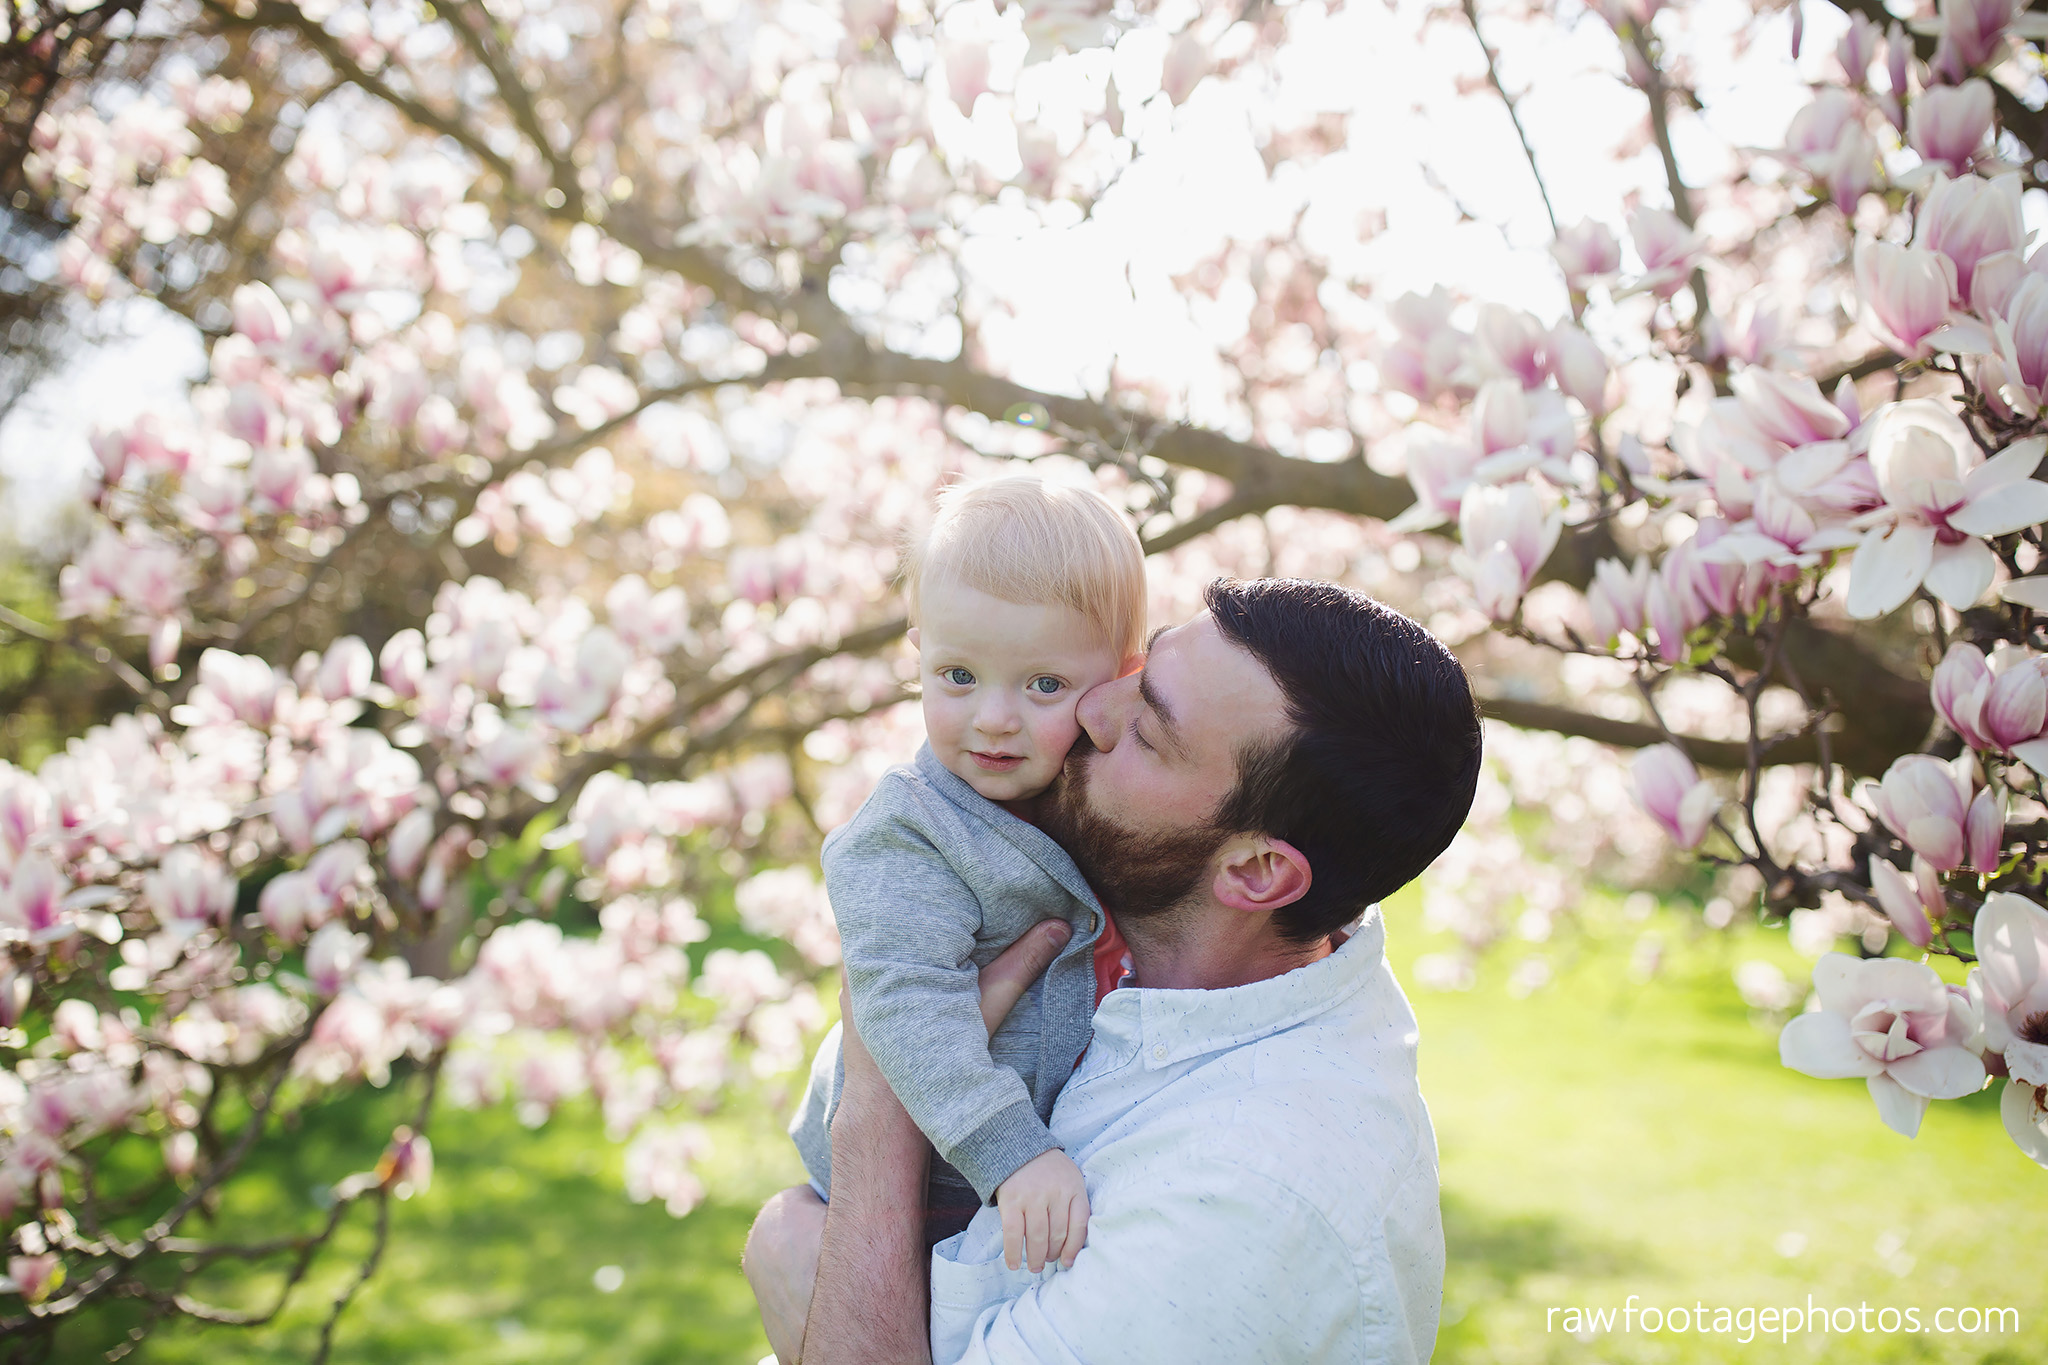 london_ontario_family_photographer-raw_footage_photography-spring_blossom_mini_sessions-magnolia-springbank_park012.jpg